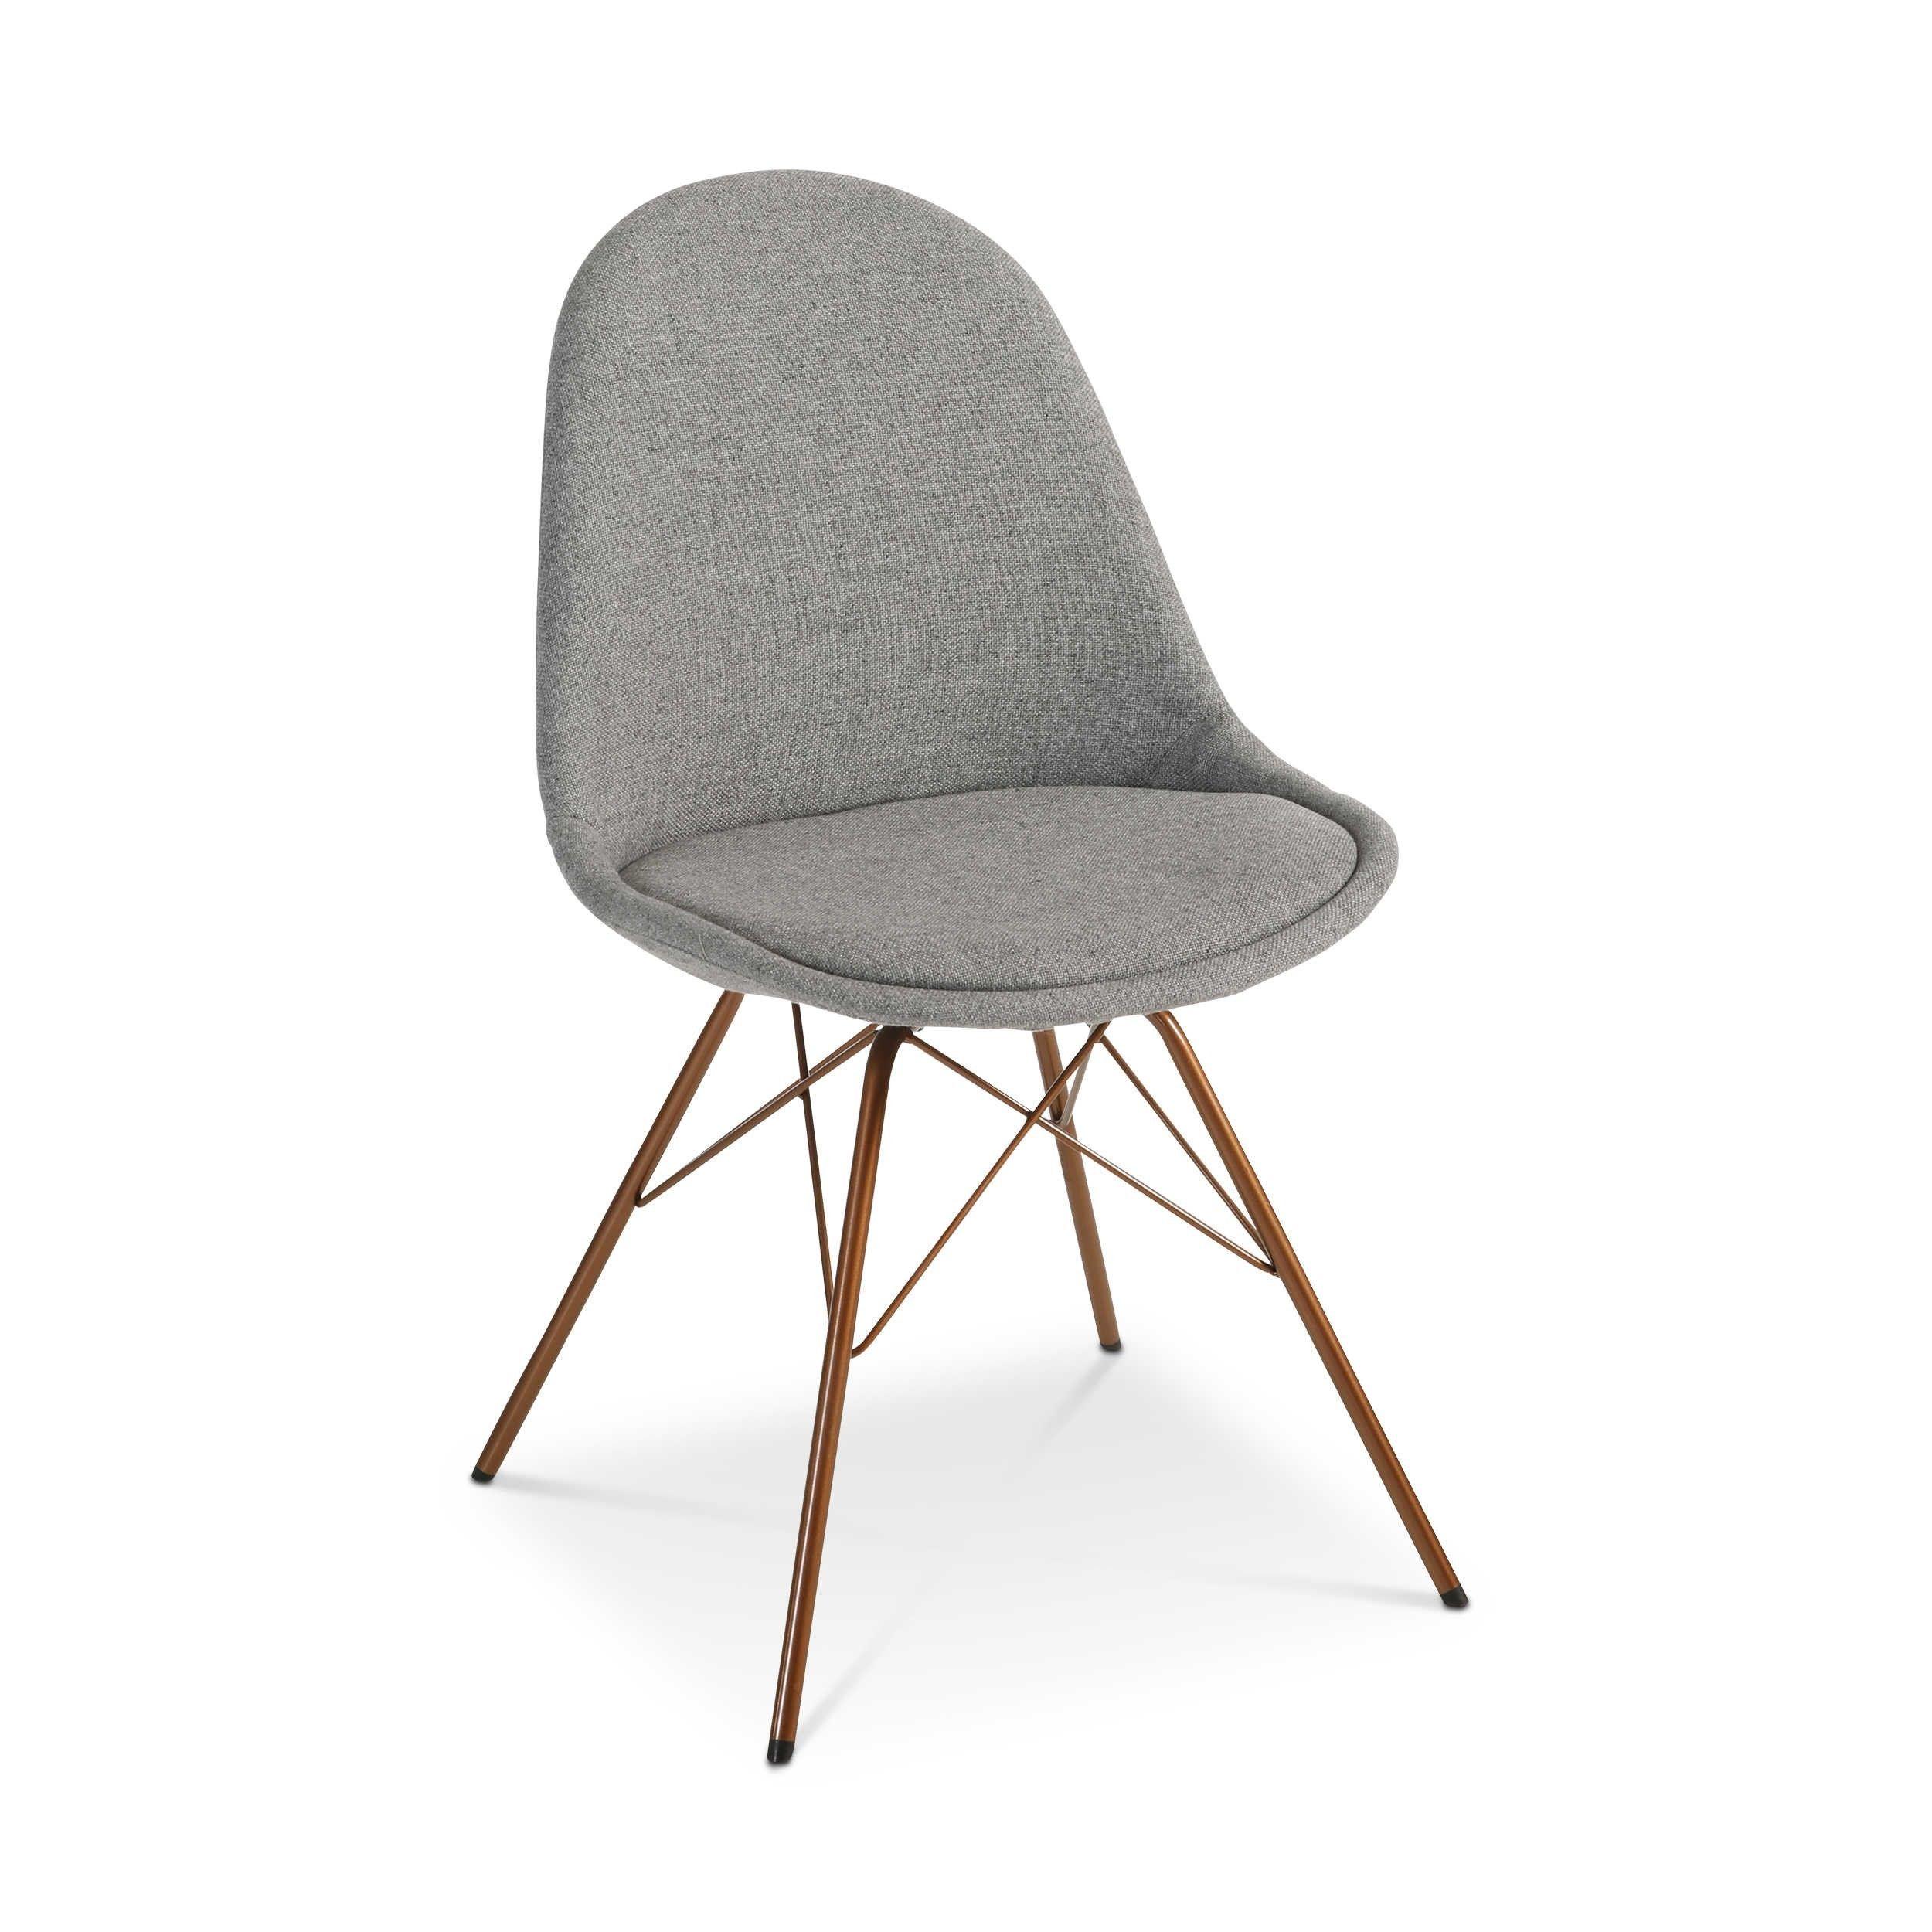 Nett Grauer Stuhl